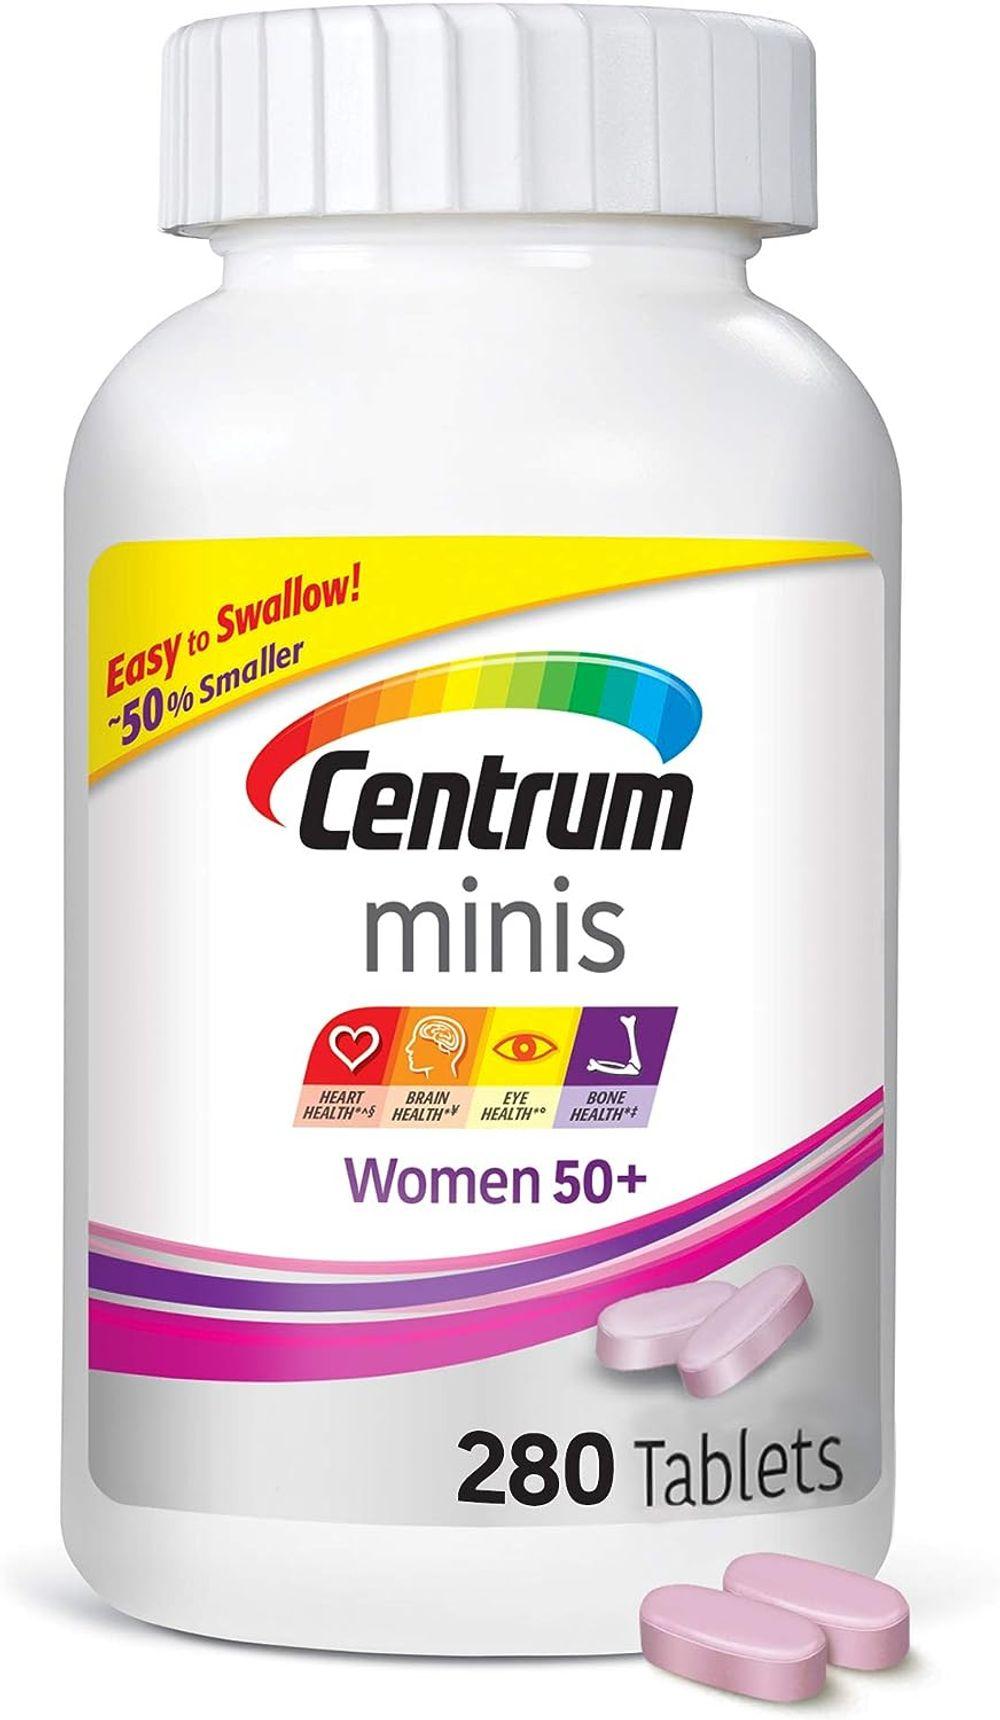 Centrum Minis Women 50+ (280 Count) Multivitamin/Multimineral Supplement Tablets